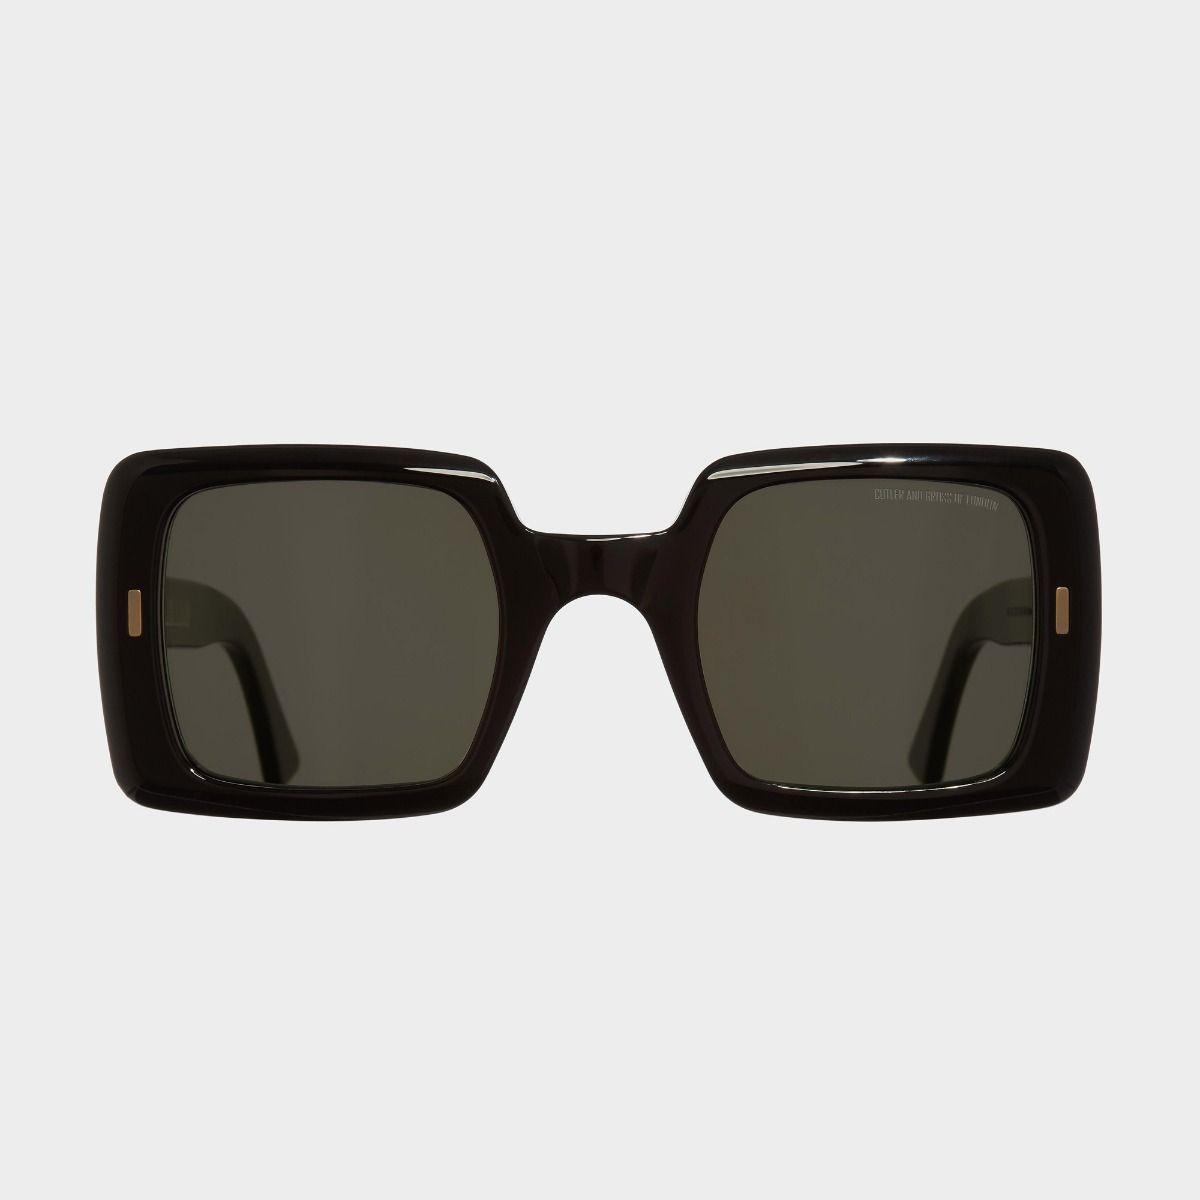 1326 Oversize Square Sunglasses